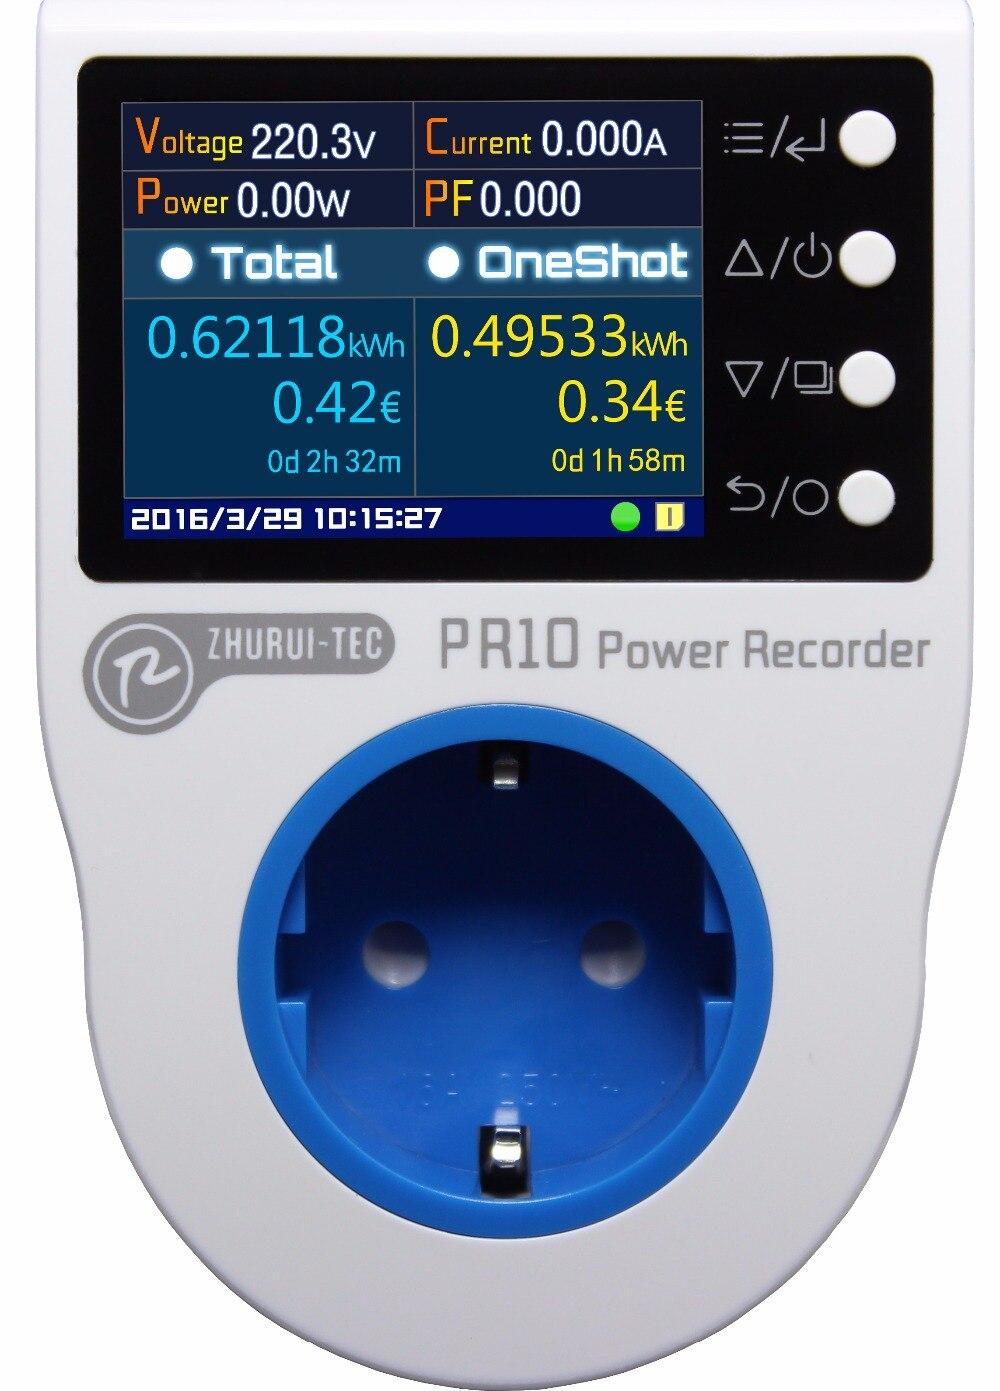 PR10-C EU16A (tedesco plug) casa presa di misurazione di potenza/home energy meter/power registratore/elettricità metri/16 unità di valuta